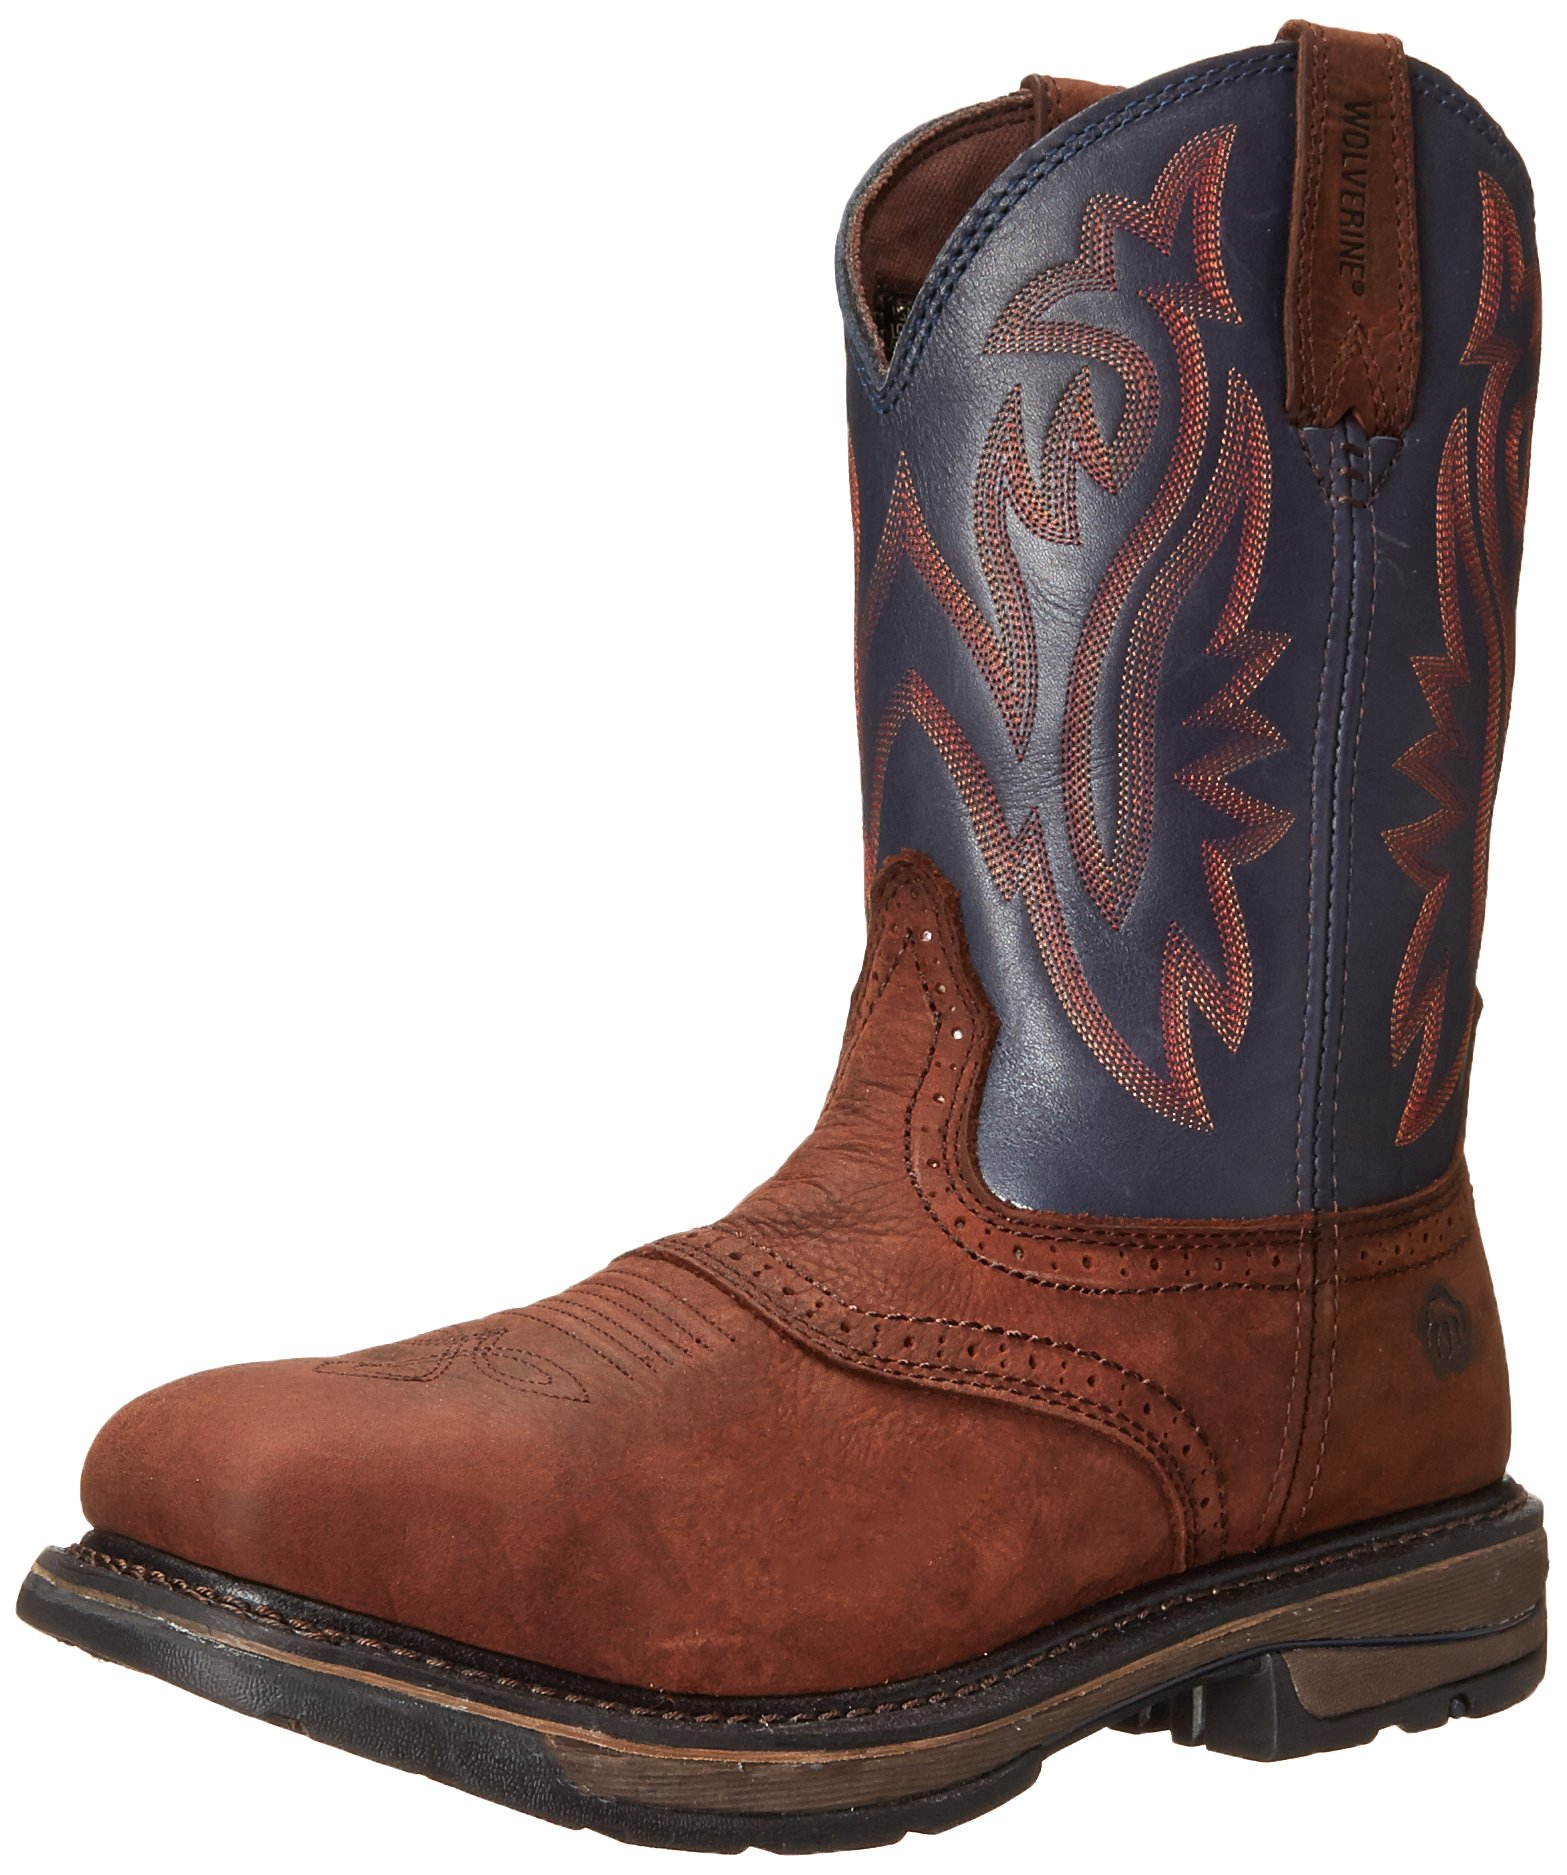 Wolverine Men's W10244 Javelina Boot, Blue, 11.5 M US